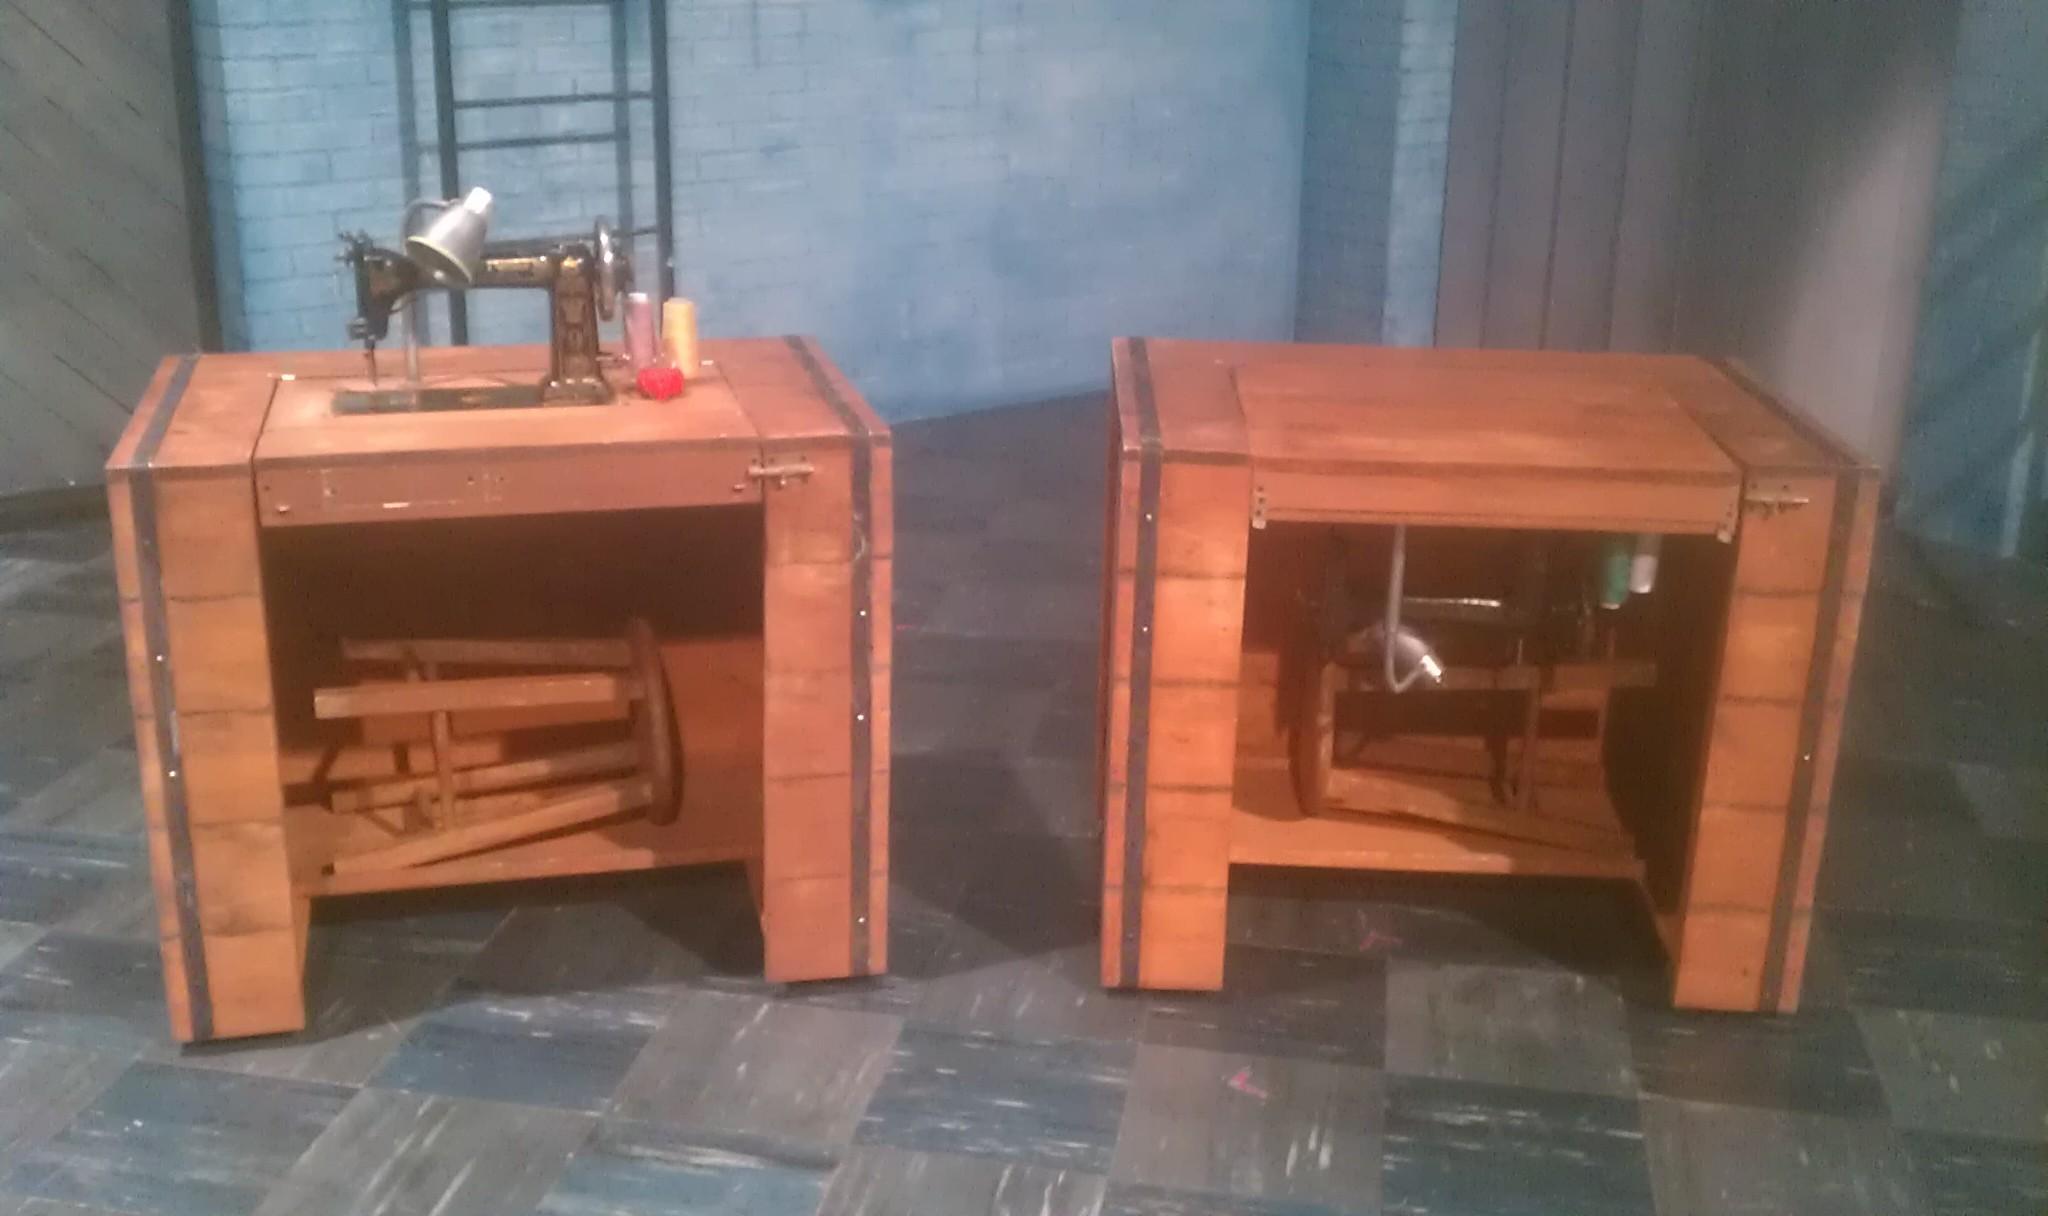 Sewing Machine Table Design : northwestern university evanston il scenic designer kristina herne ...